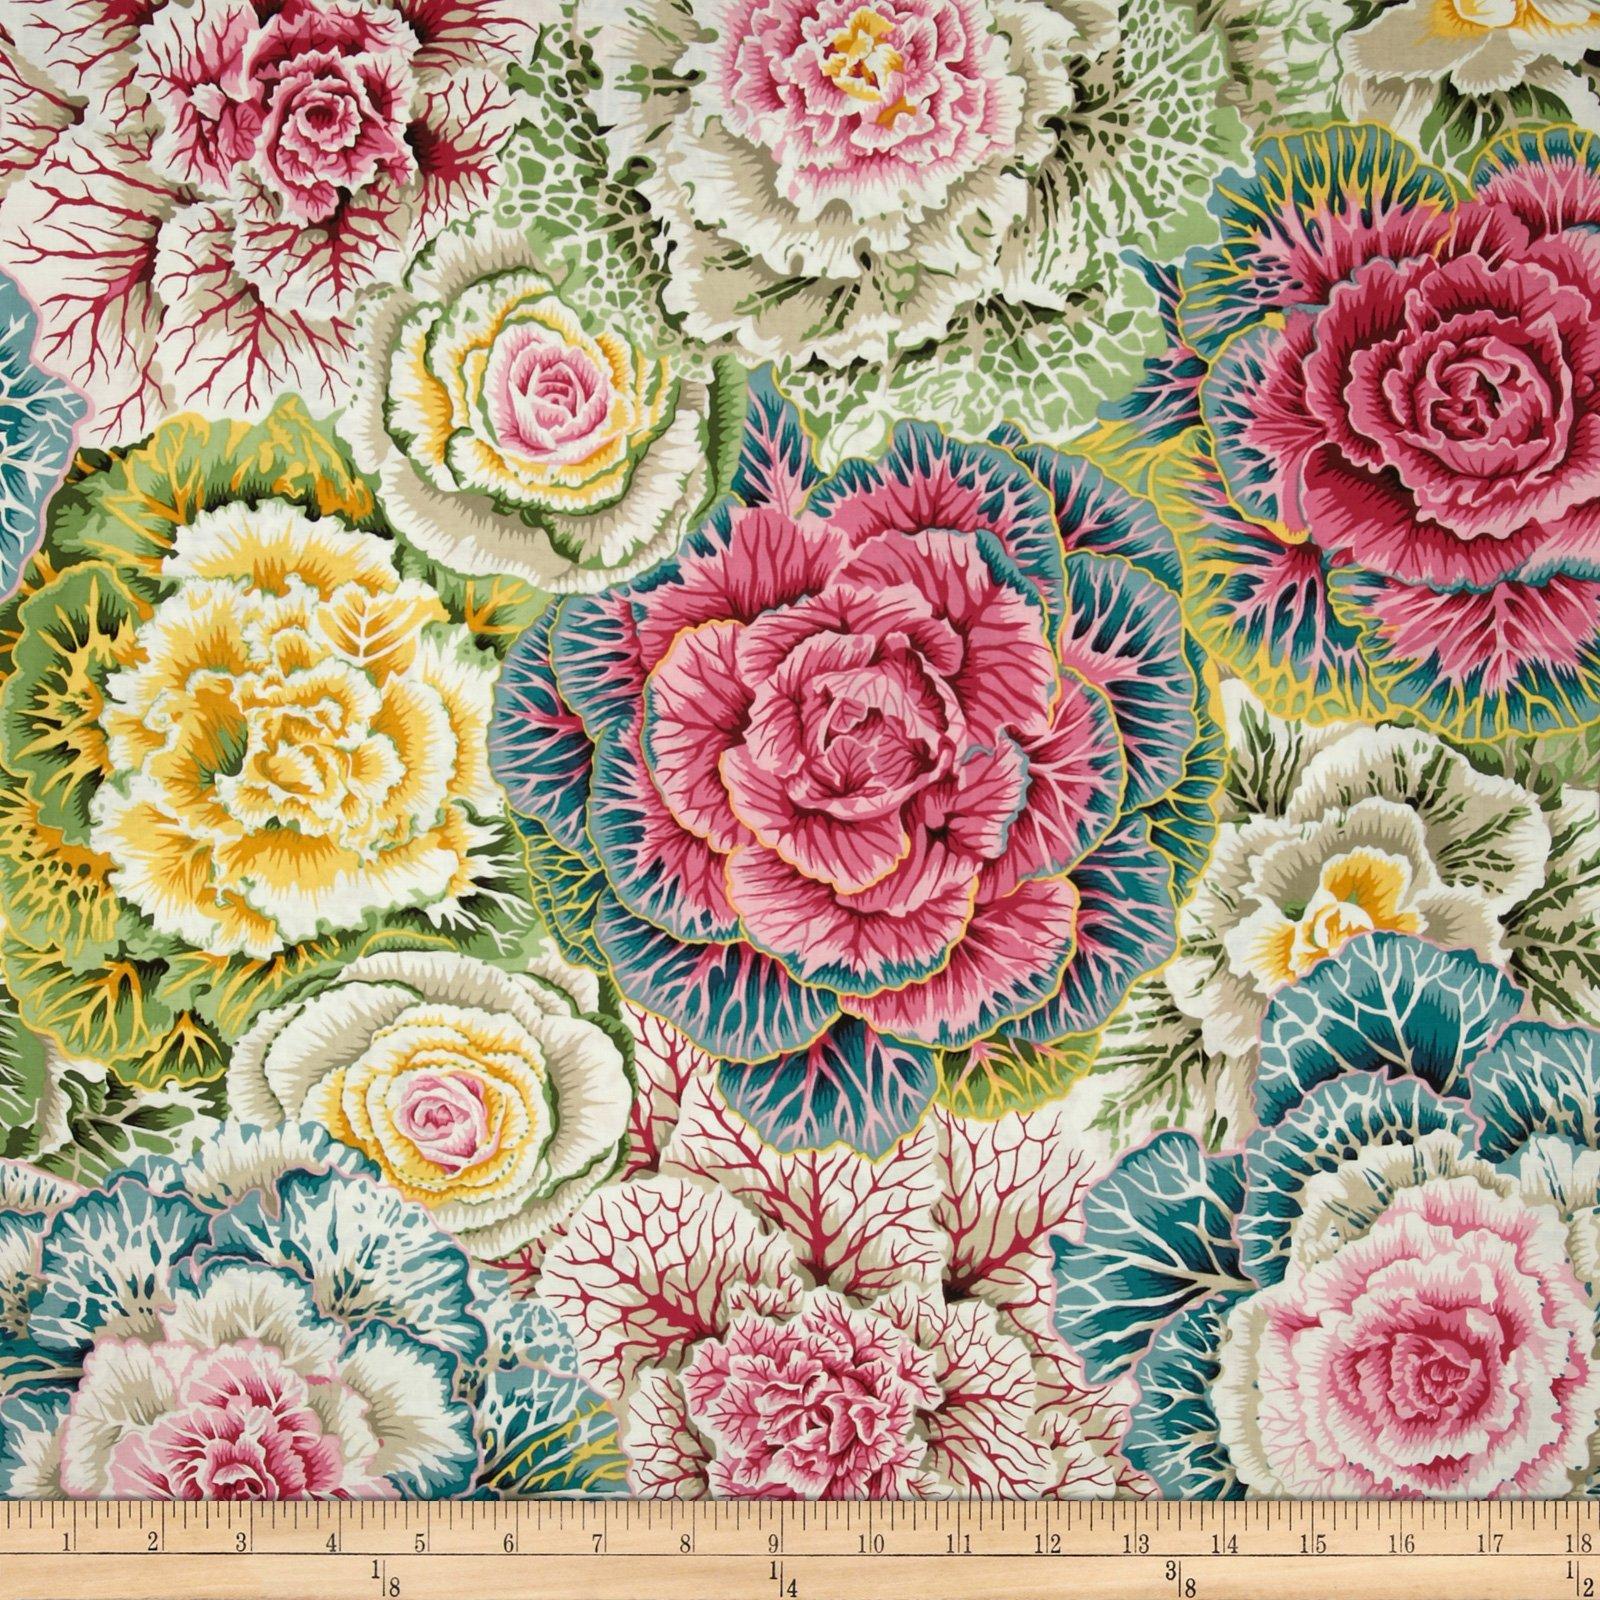 FreeSpirit Fabrics Kaffe Fassett Collective Brassica Pastel Fabric By The Yard